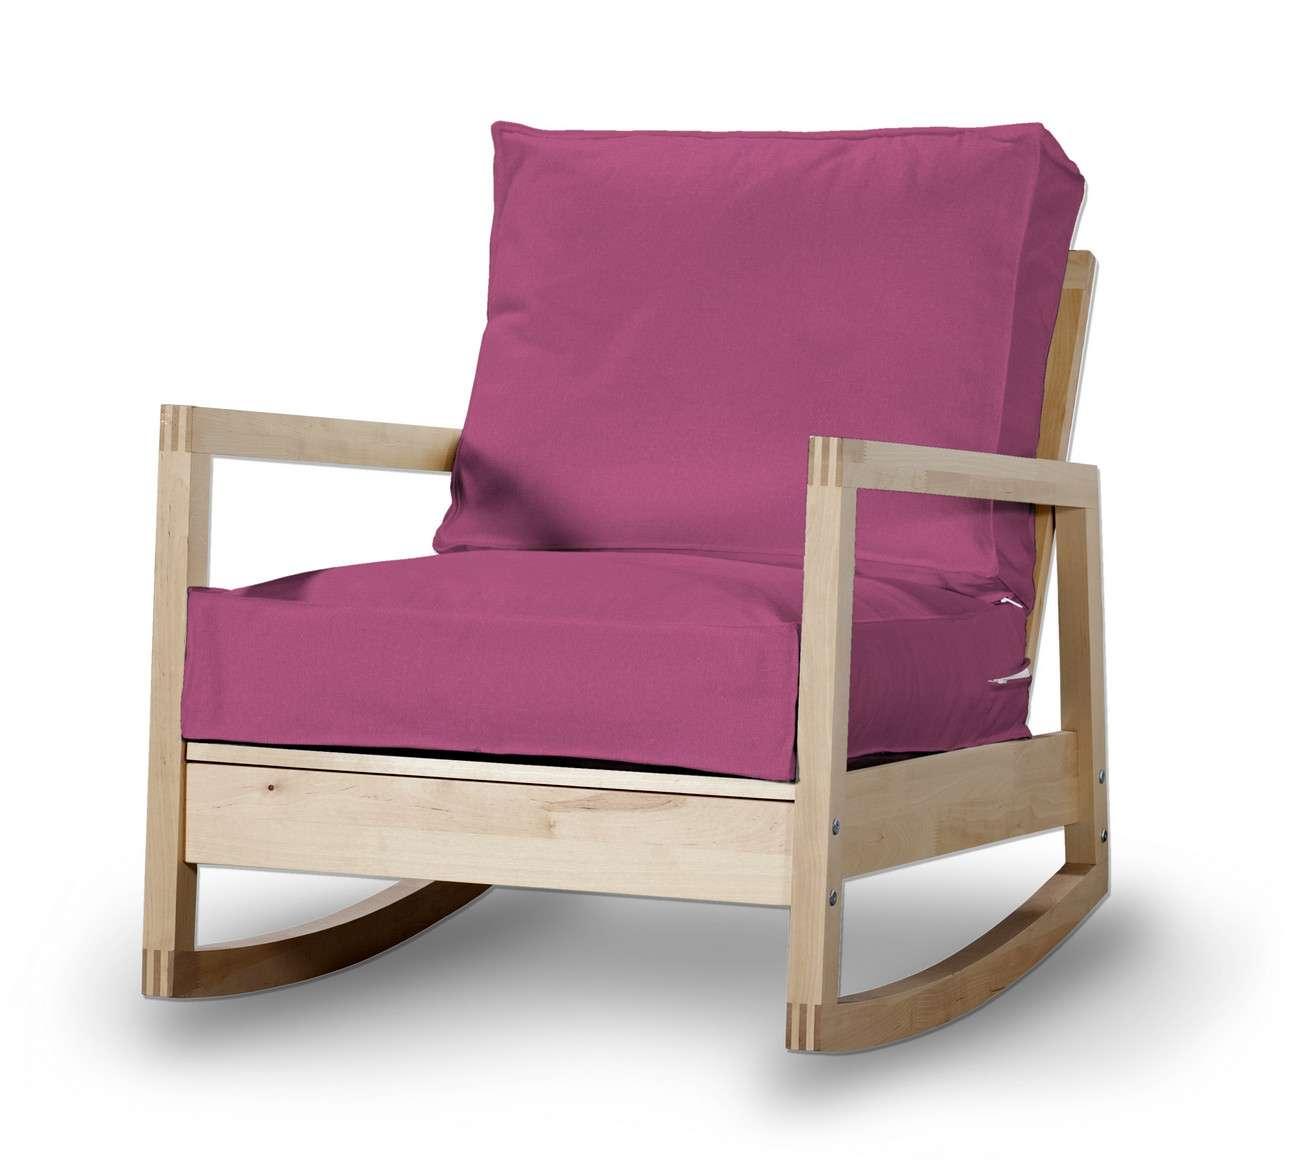 Pokrowiec na fotel Lillberg w kolekcji Living, tkanina: 161-29